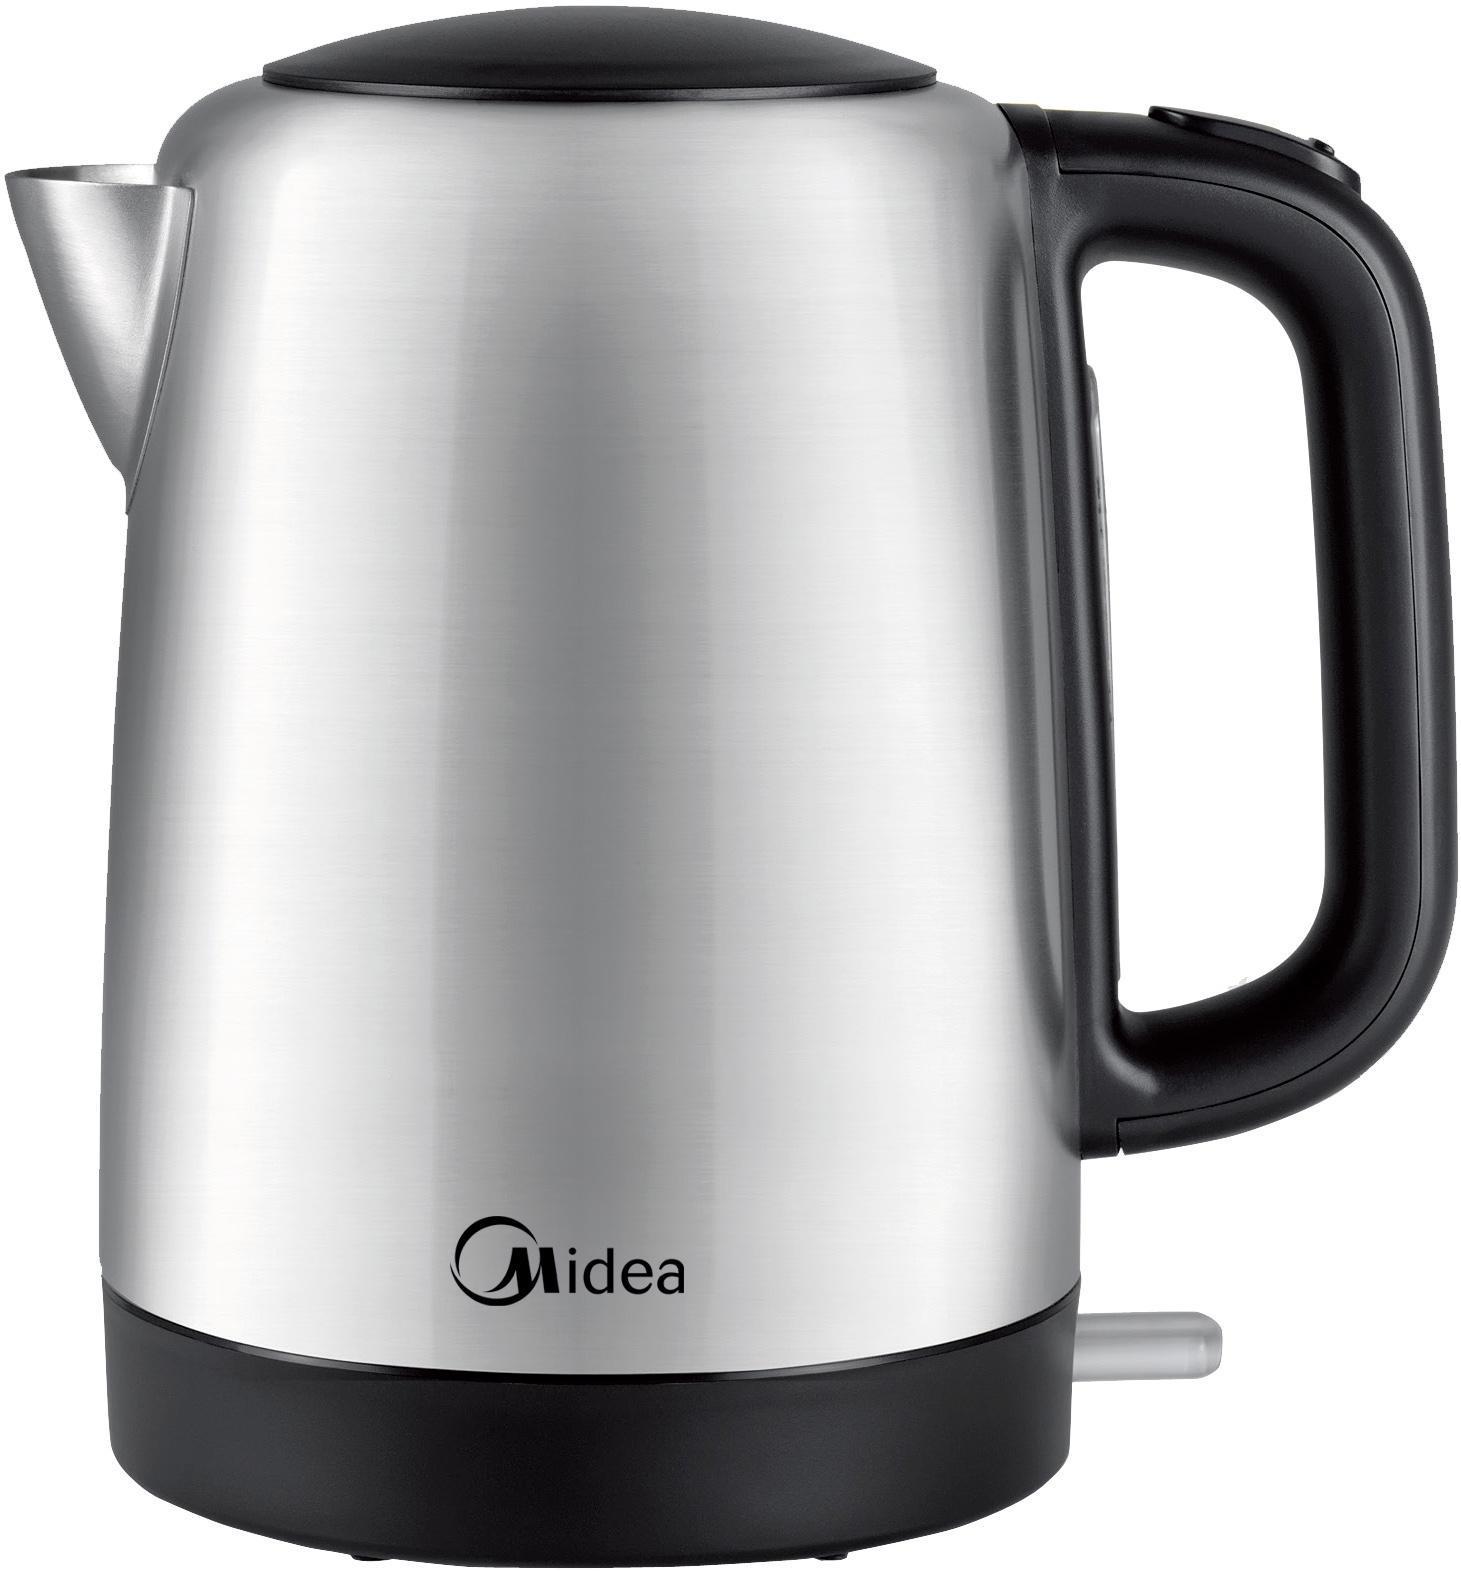 Midea MK-M317B2A электрический чайник